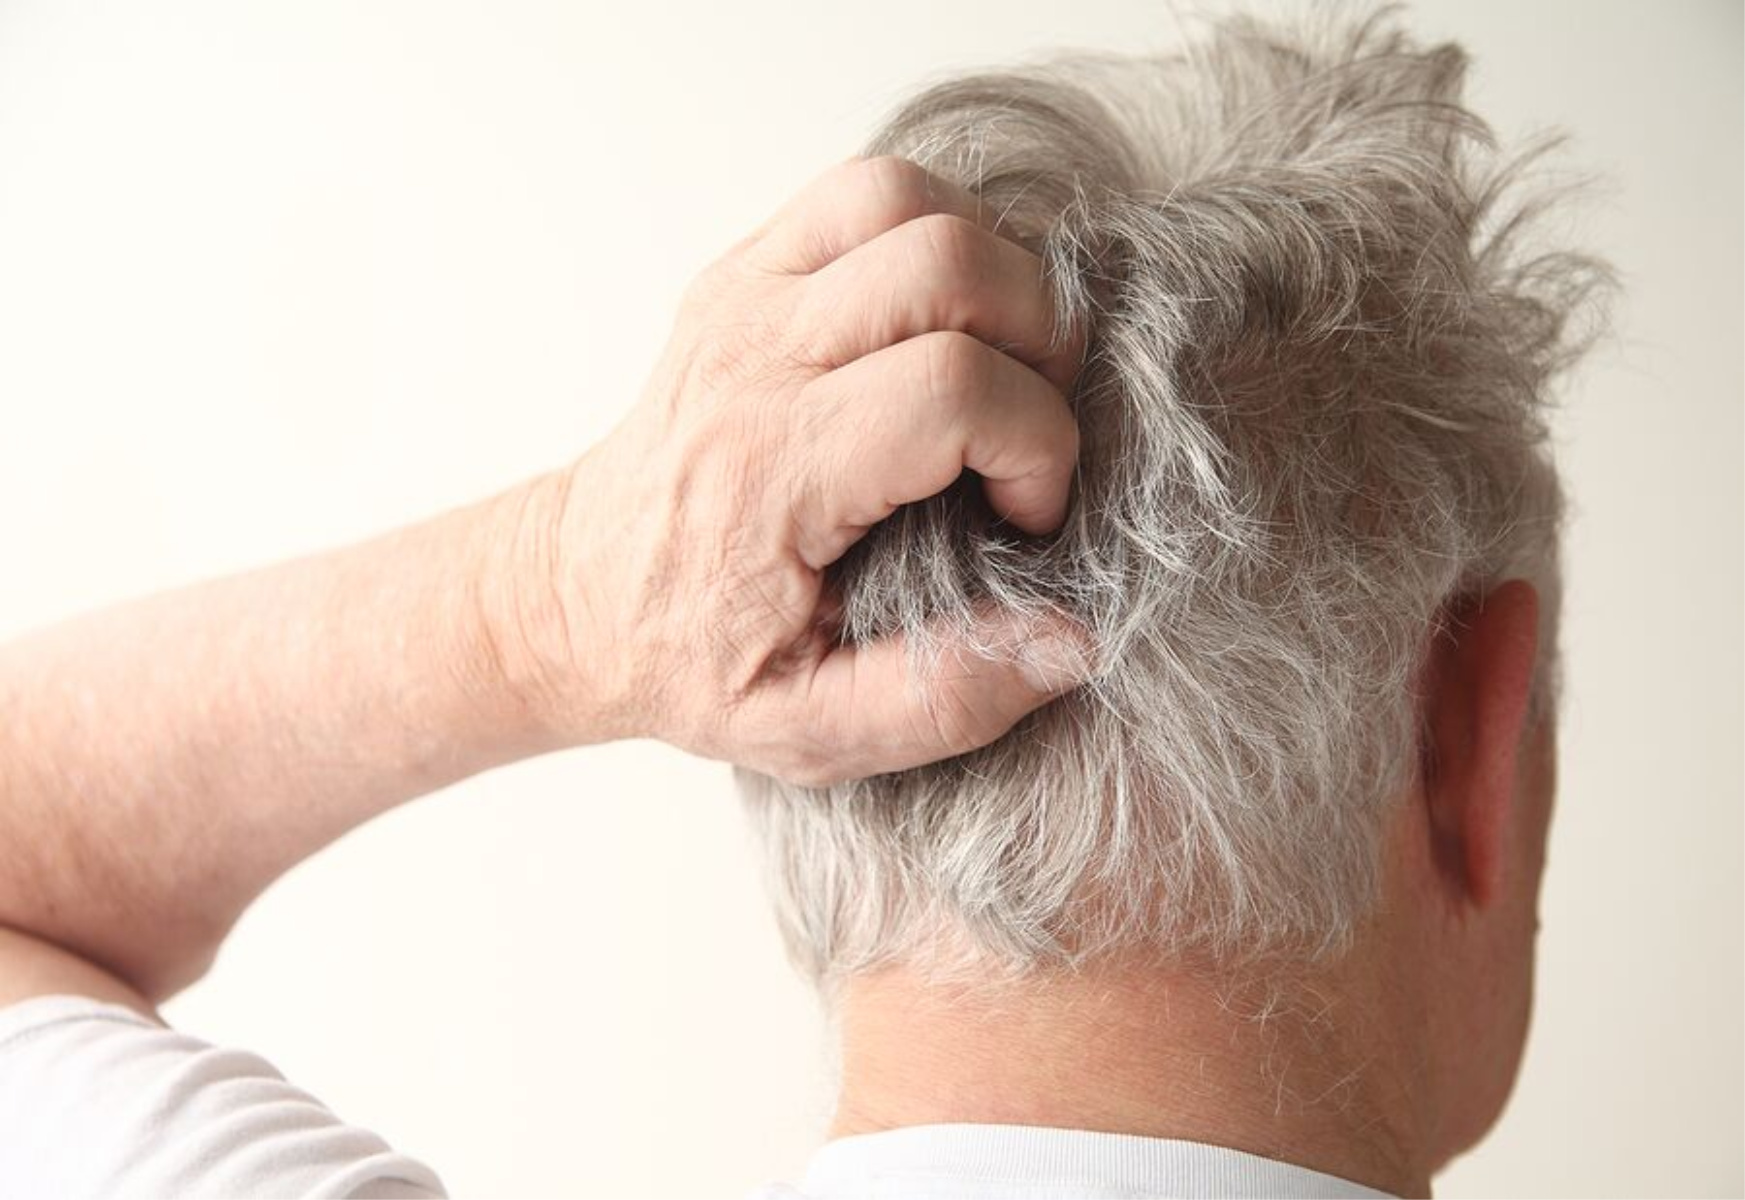 Senior Health: Memory Loss